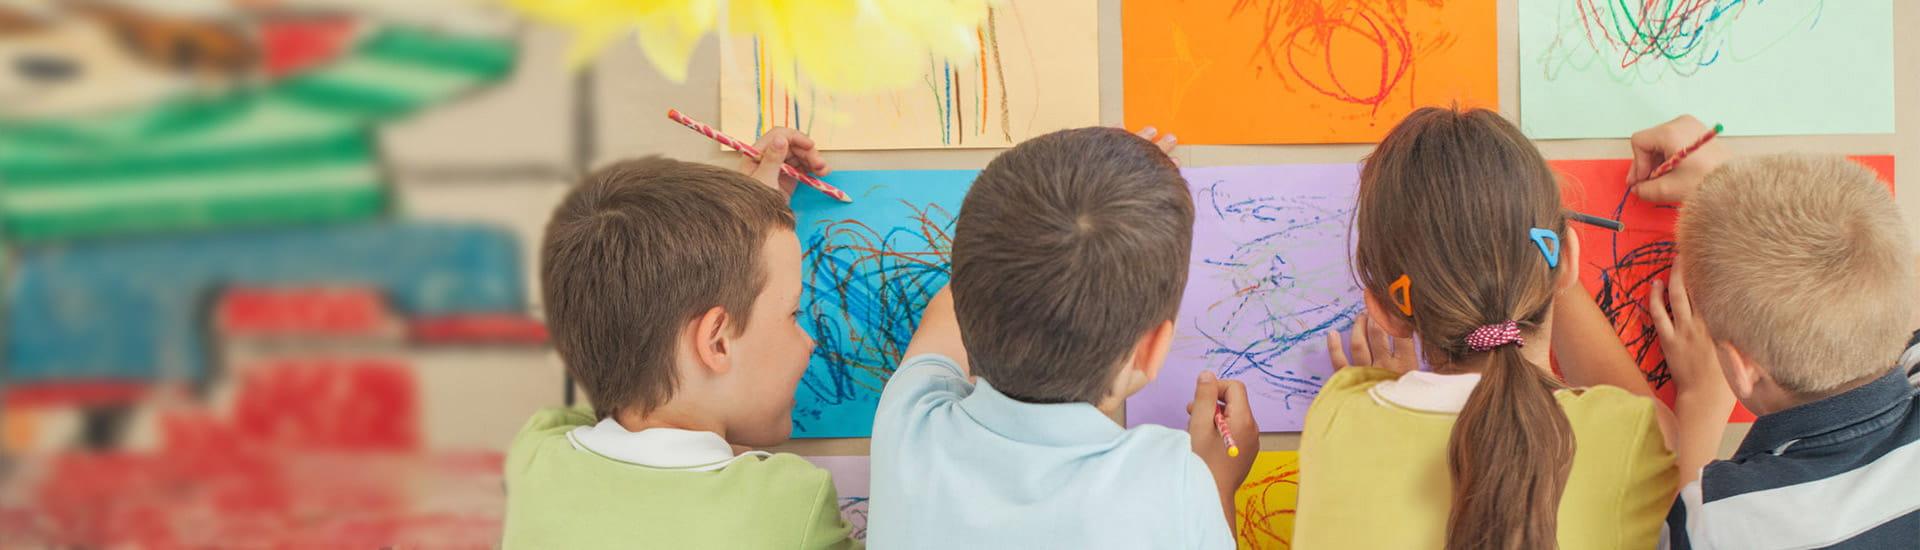 Highland KinderCare | Daycare, Preschool & Early Education